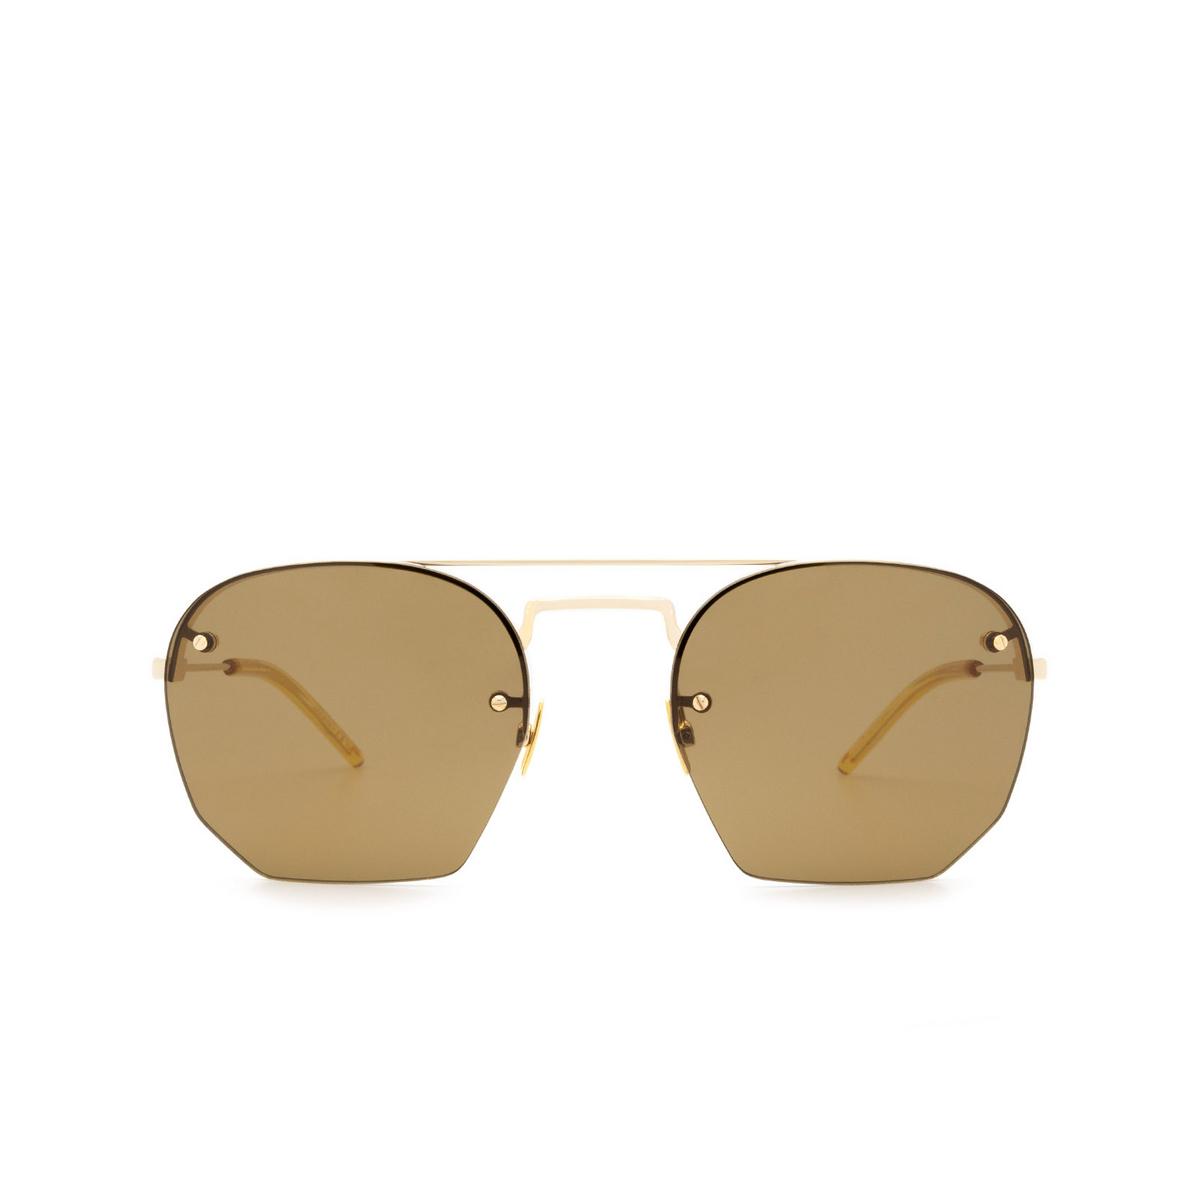 Saint Laurent® Irregular Sunglasses: SL 422 color Gold 001 - 1/3.